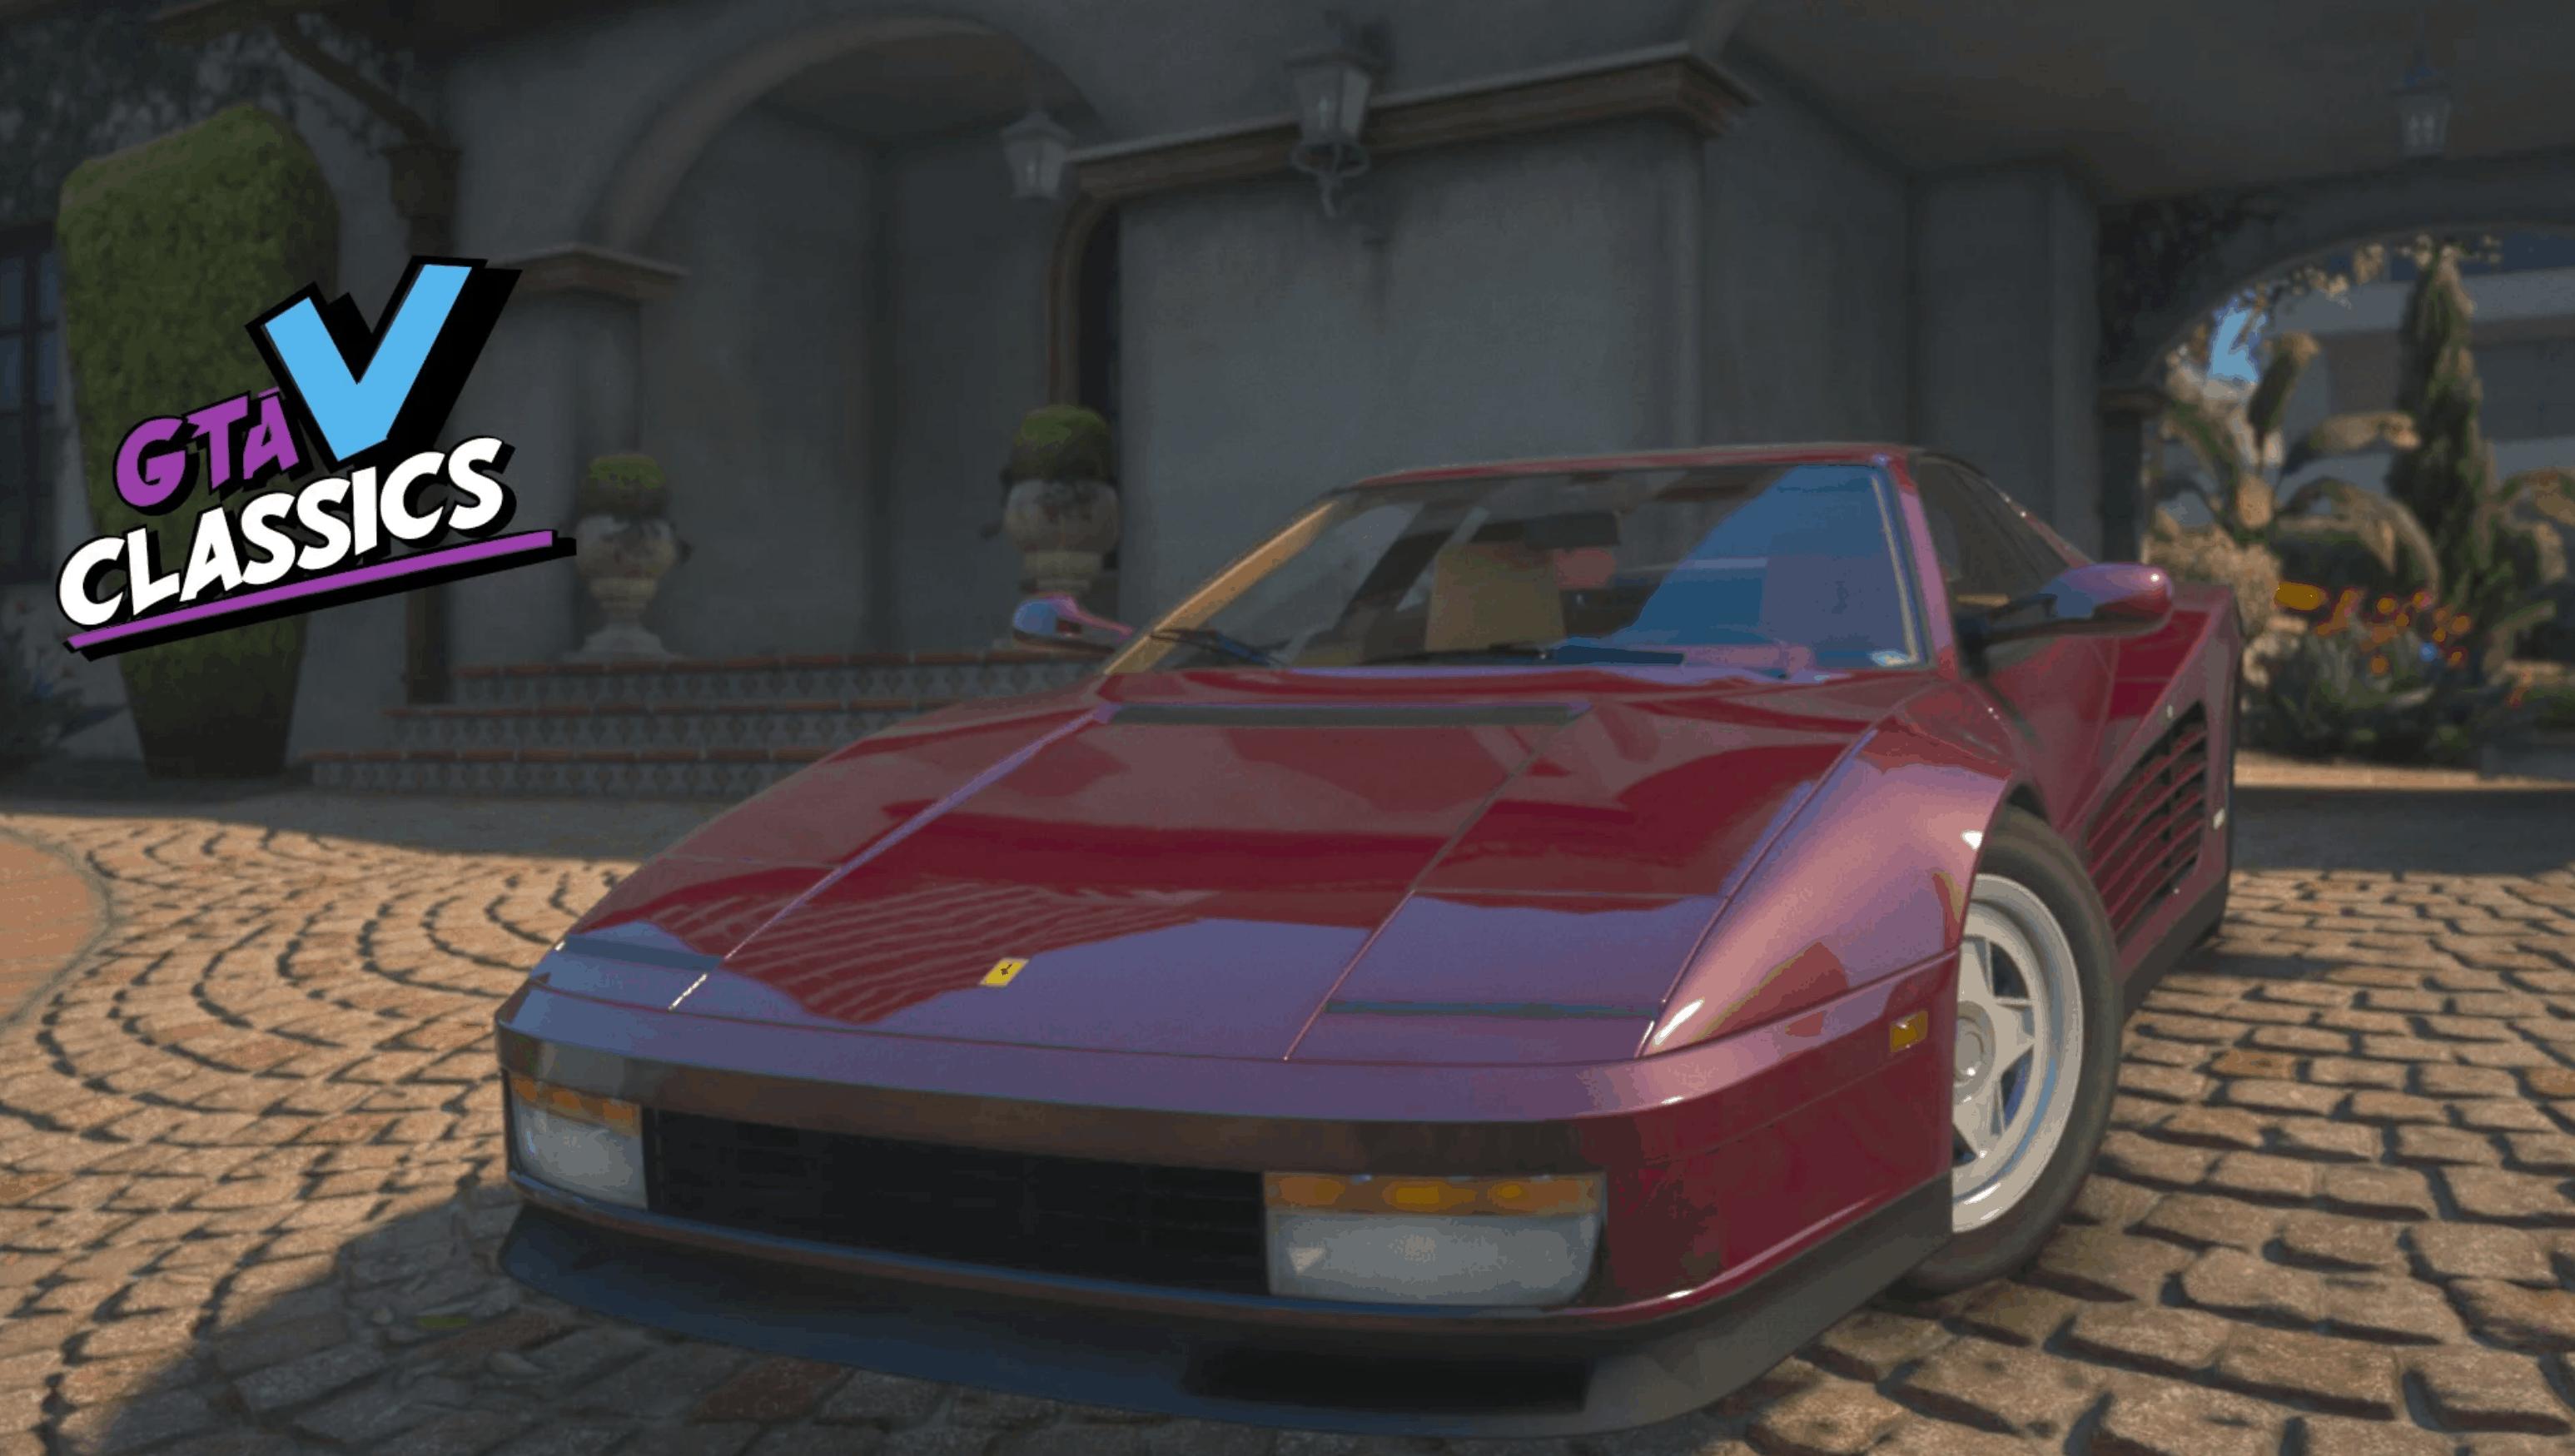 1987 Ferrari Testarossa Gta 5 Mod Grand Theft Auto 5 Mod